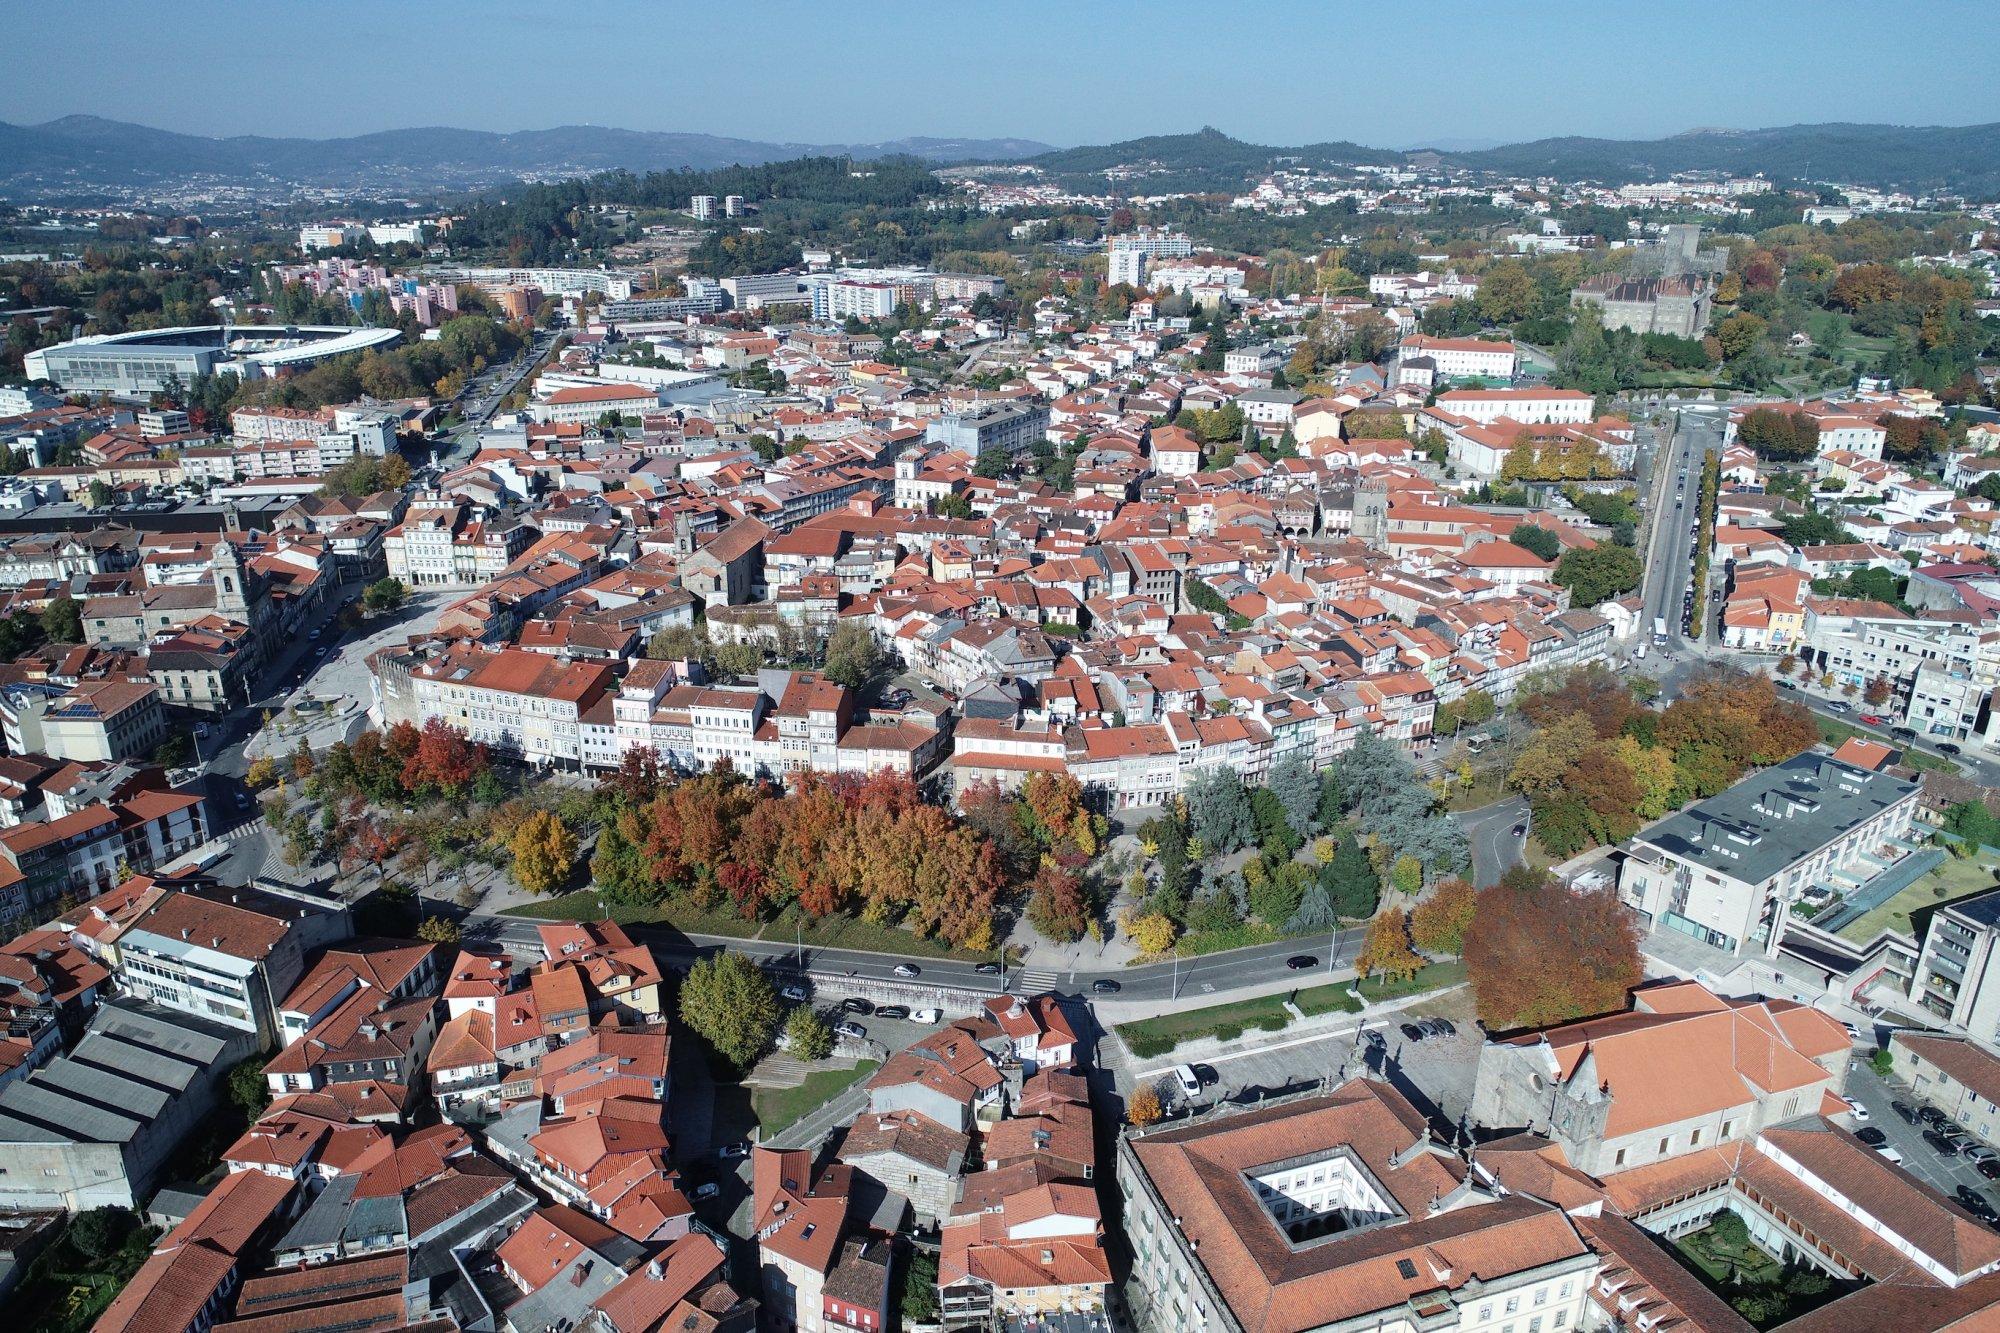 XXIII Feira de Artesanato de Guimarães